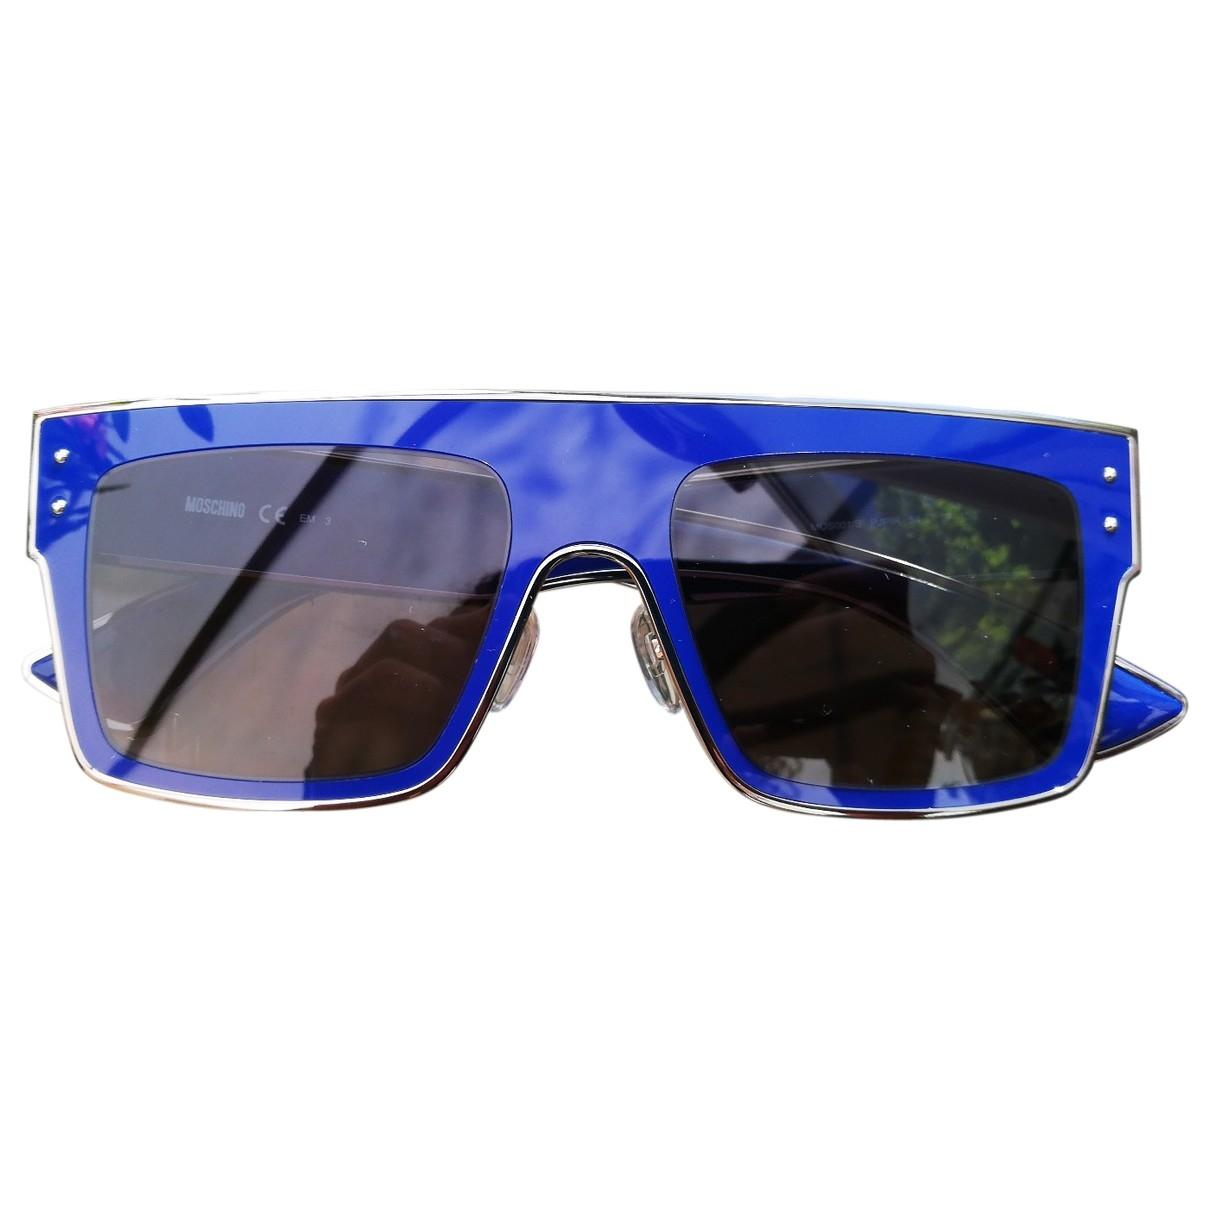 Moschino - Lunettes   pour femme en metal - bleu